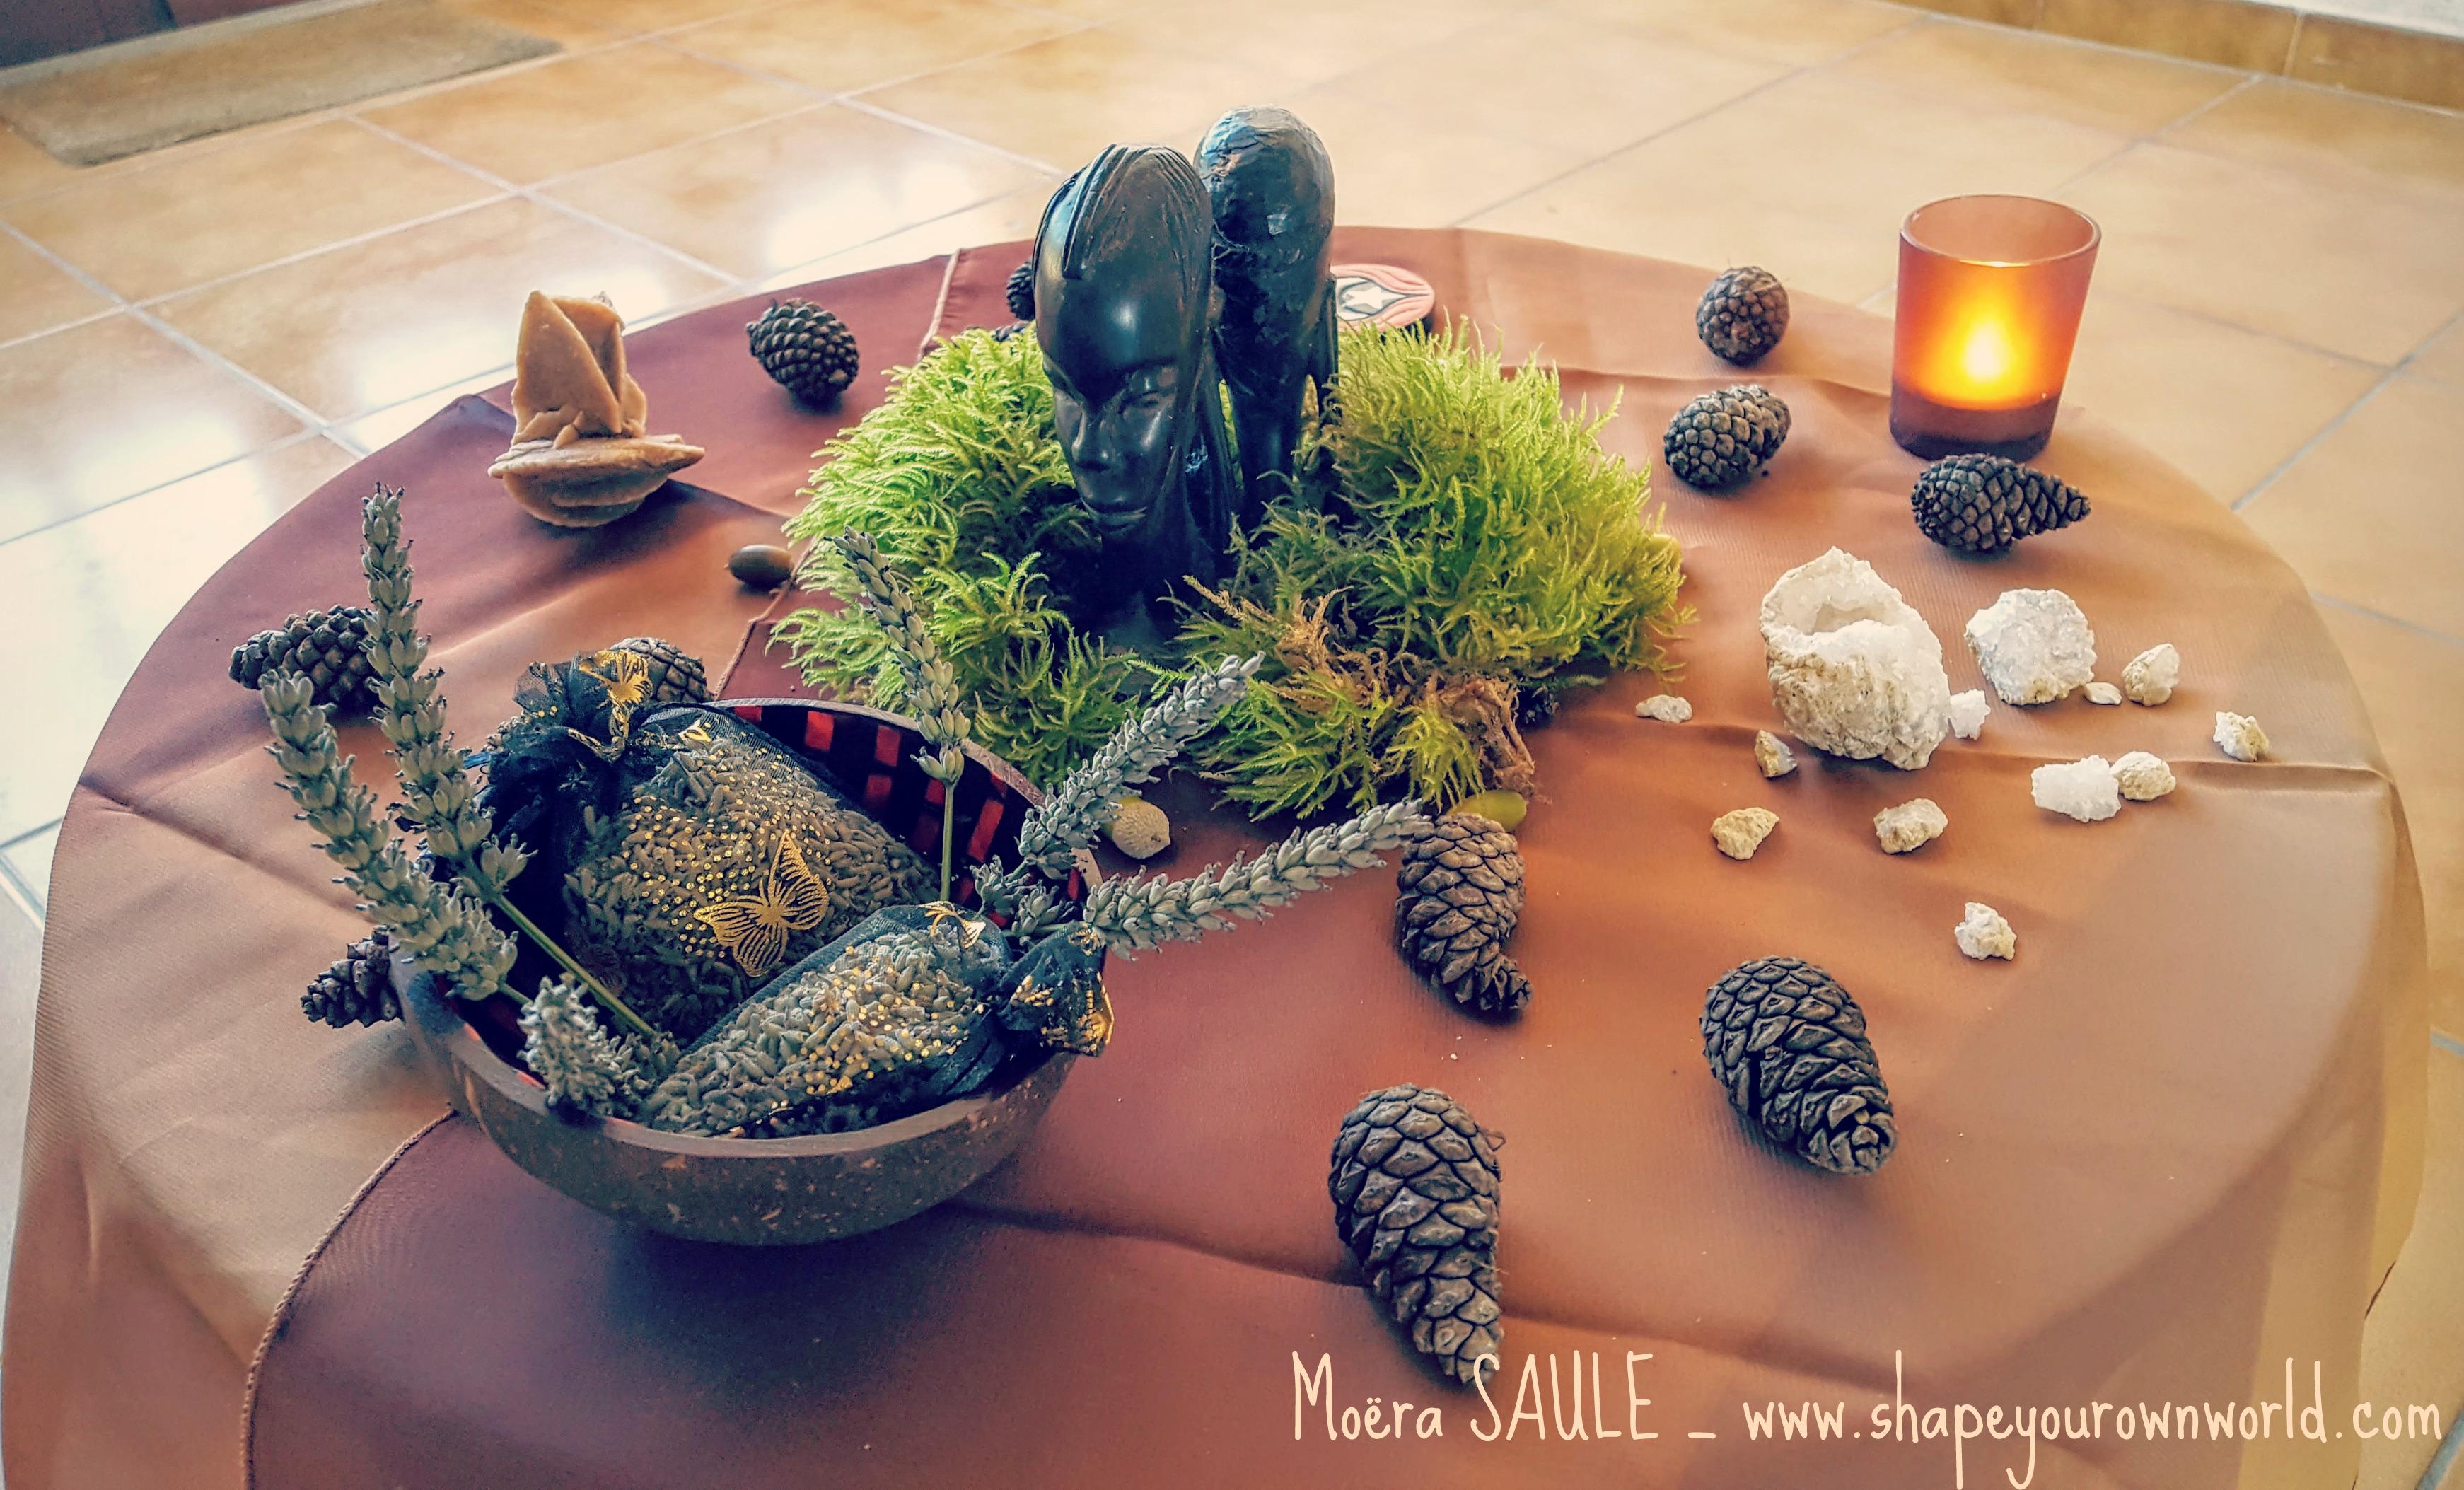 Moëra_SAULE_-_Soul_Coaching_-_Coaching_de_l'âme_-_autel_terre_-_www.shapeyourownworld.com